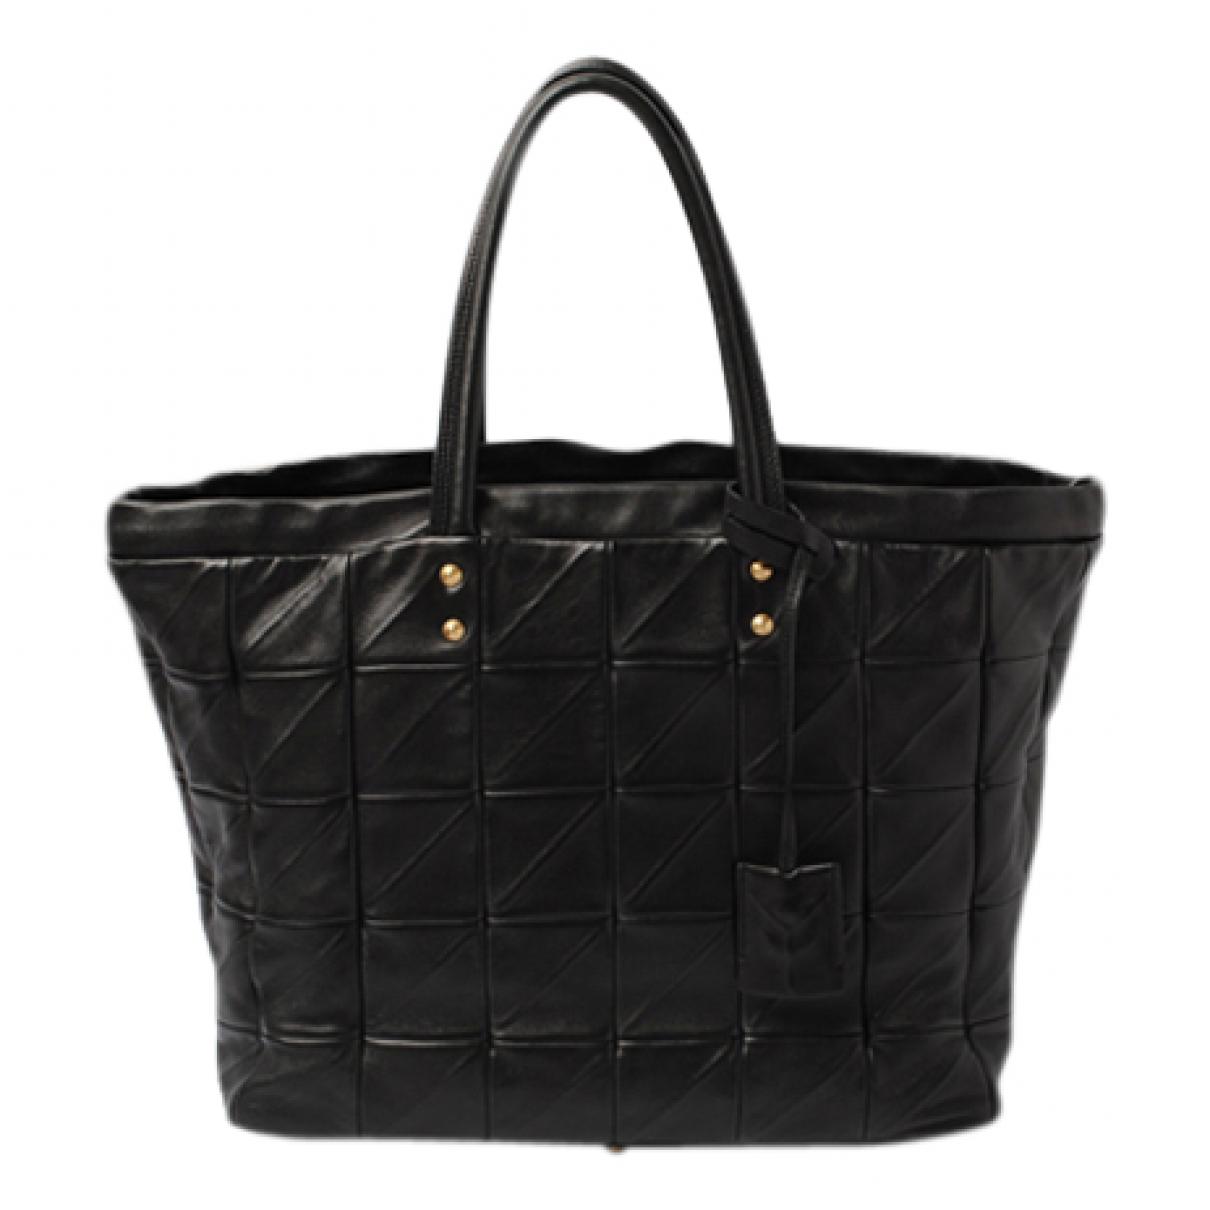 Yves Saint Laurent \N Handtasche in  Schwarz Leder